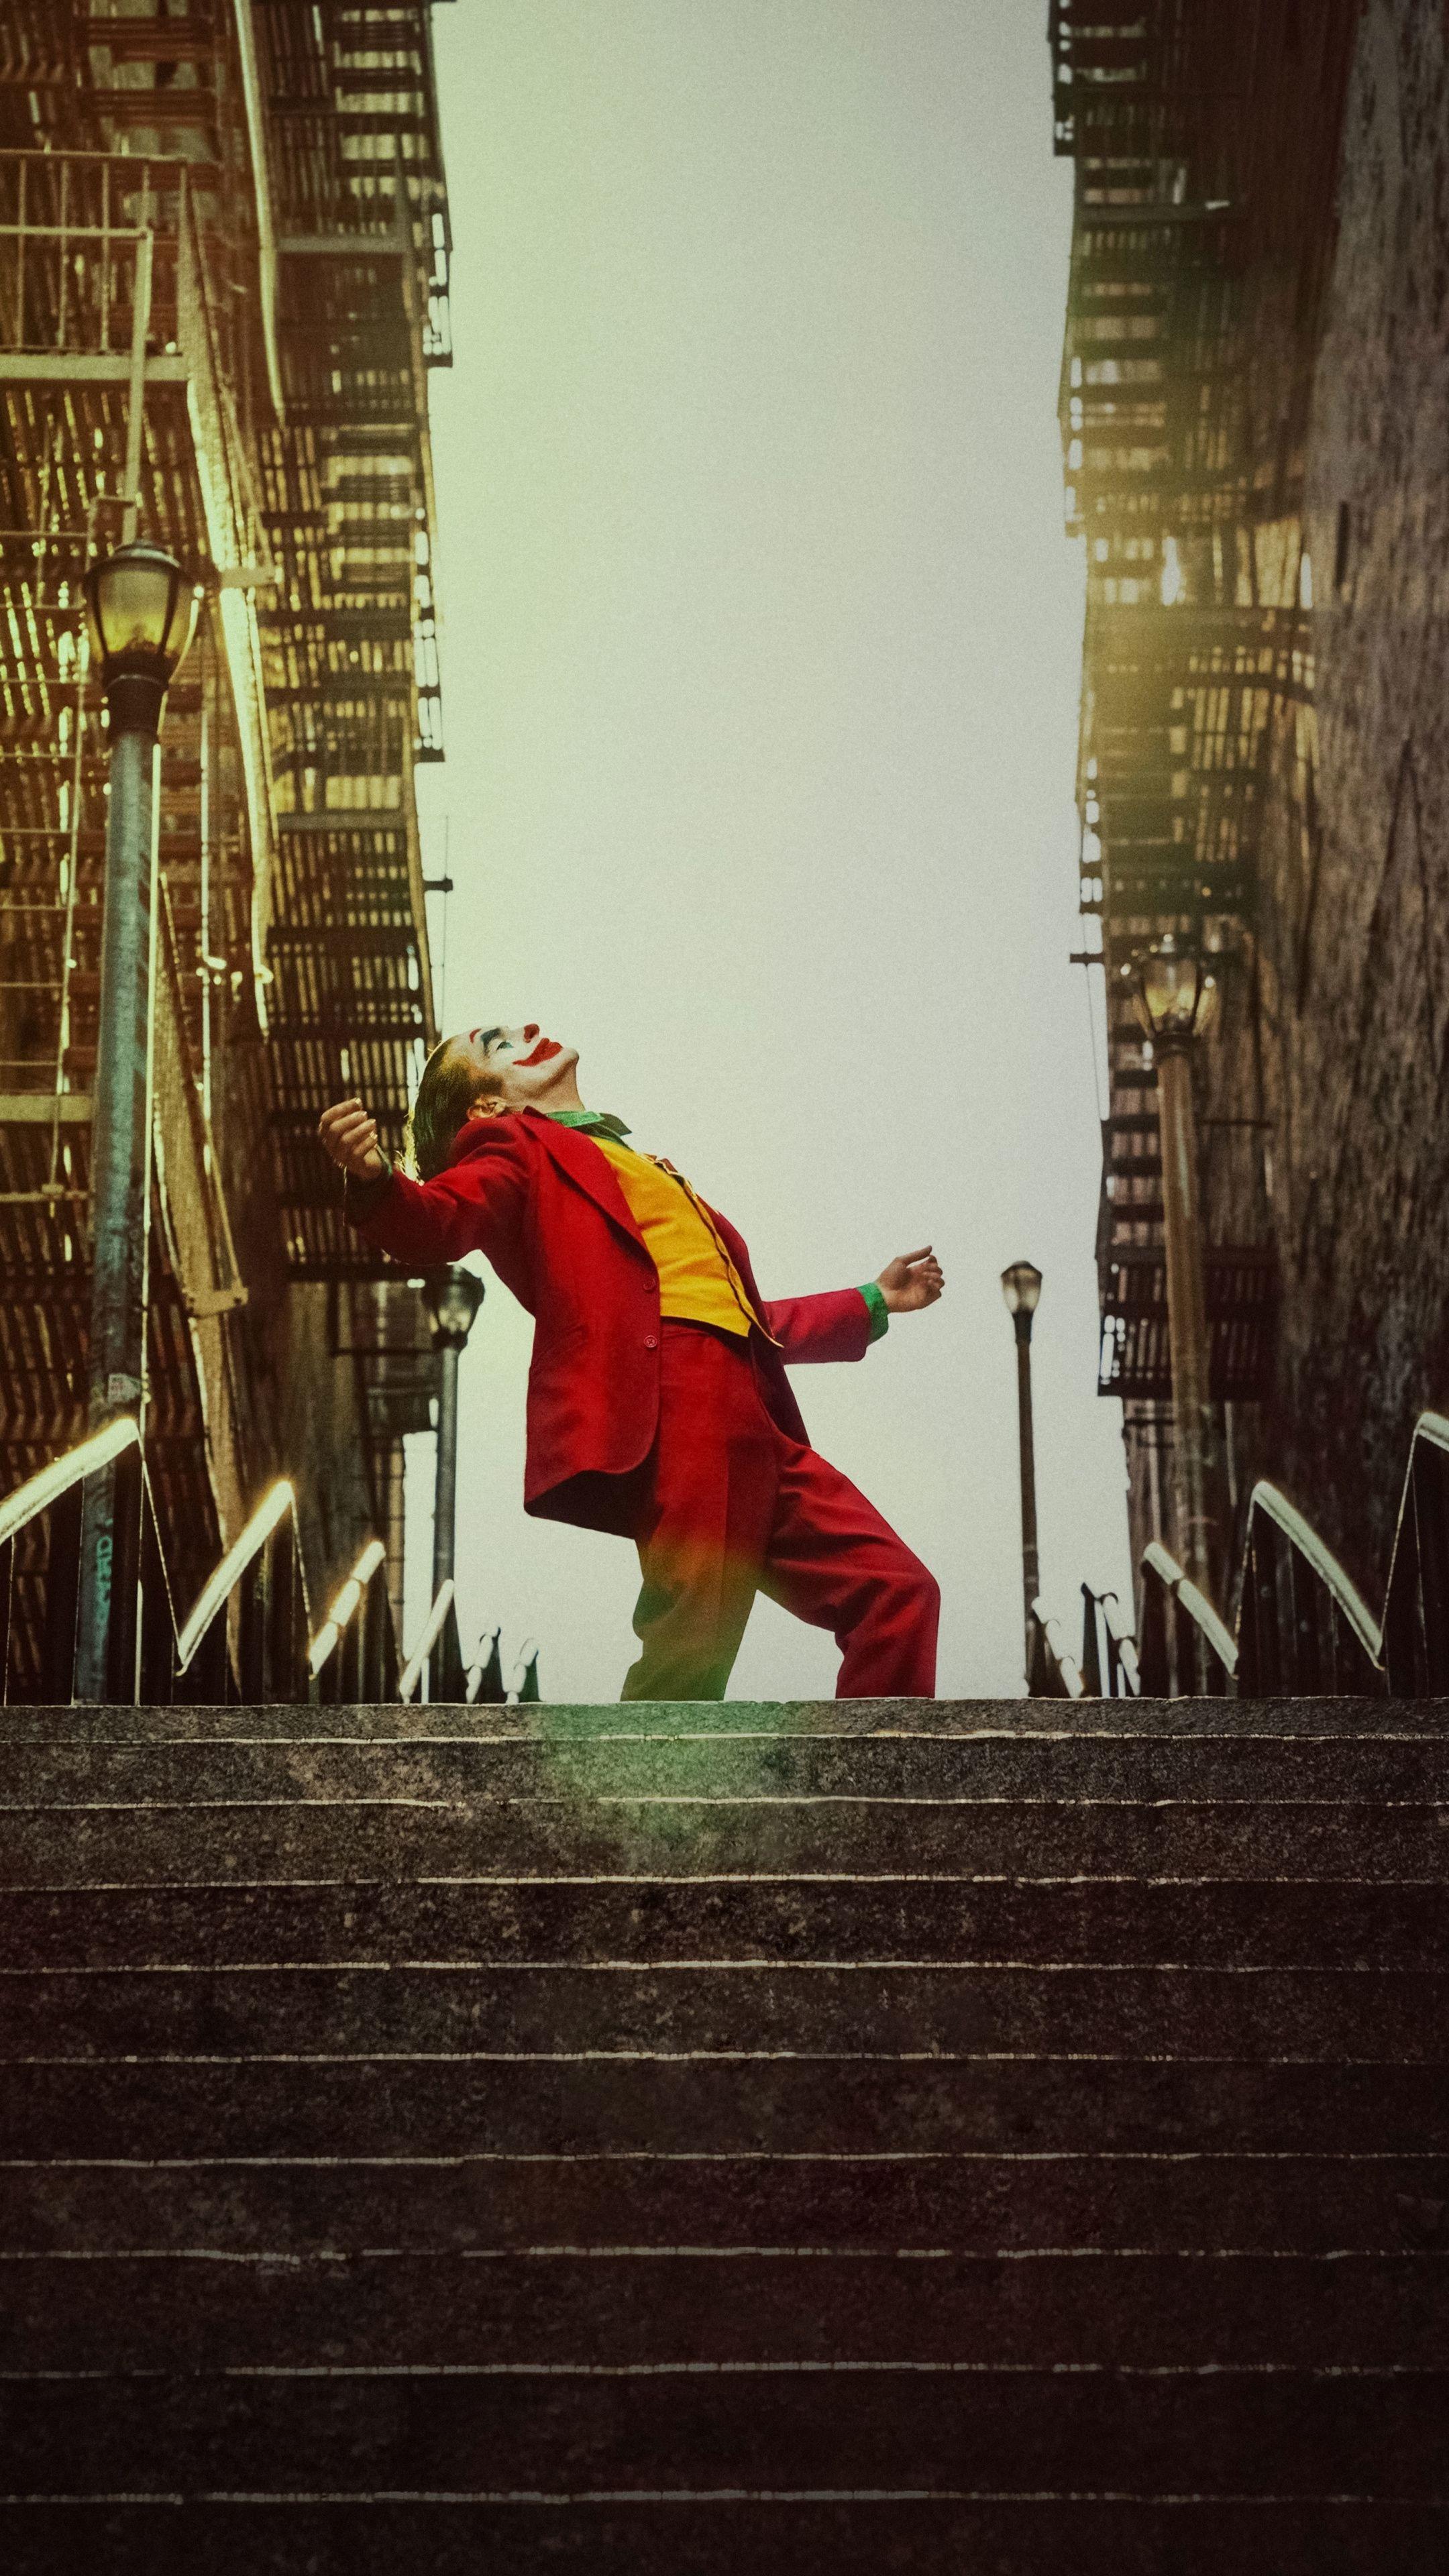 2160x3840 Joker 2019 Movie Red Suit Poster Wallpaper Joker Hd Wallpaper Joker Iphone Wallpaper Joker Film